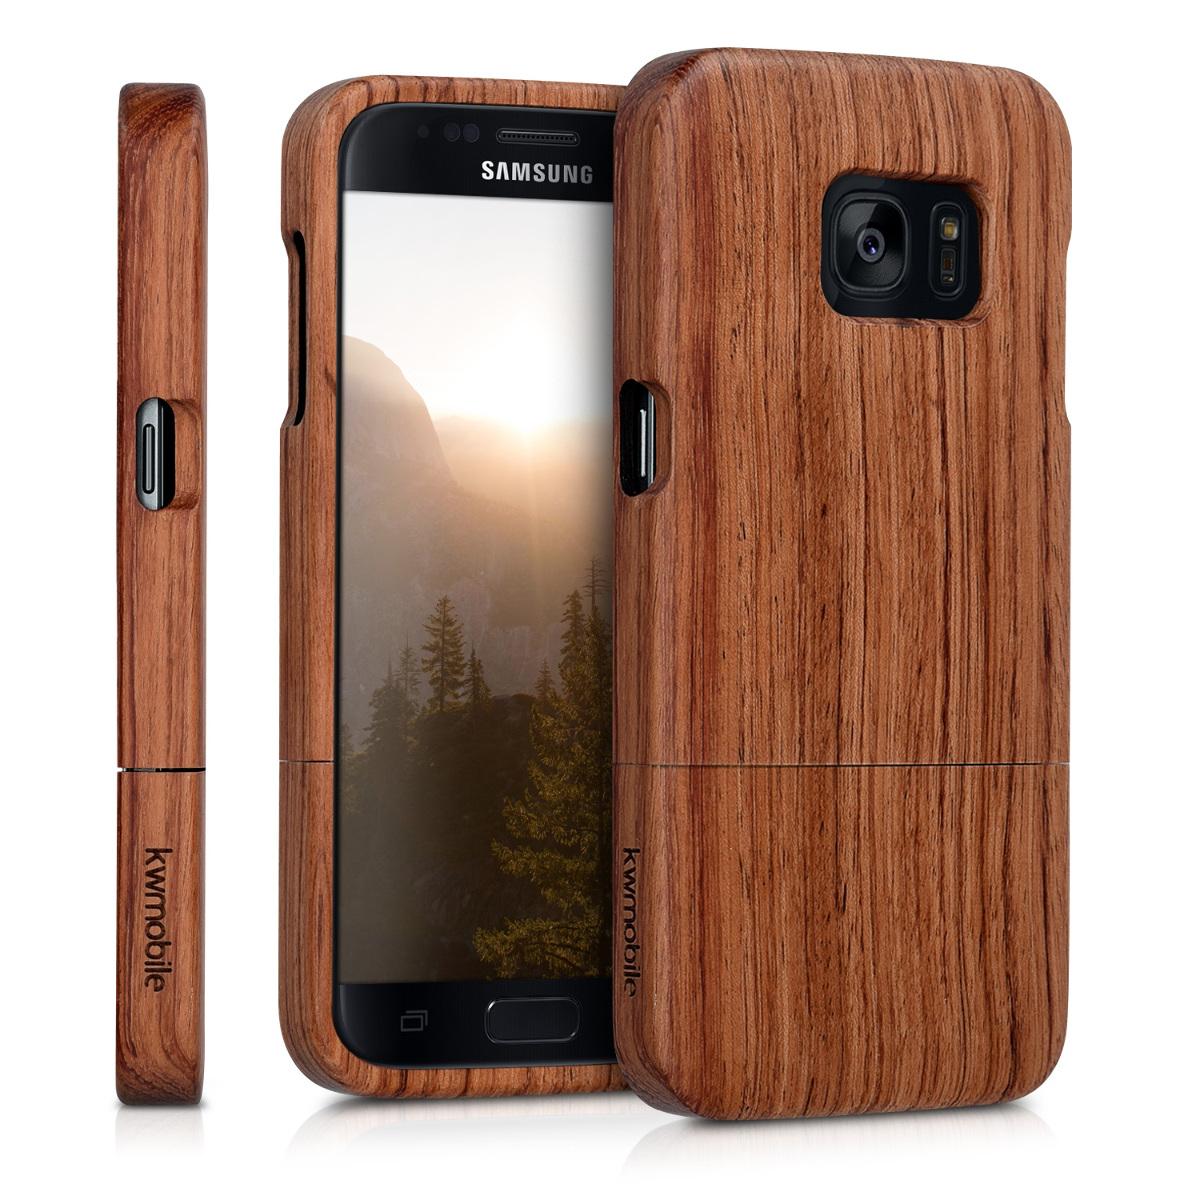 KW Σκληρή Ξύλινη Θήκη - Samsung Galaxy S7  - (37138.18)